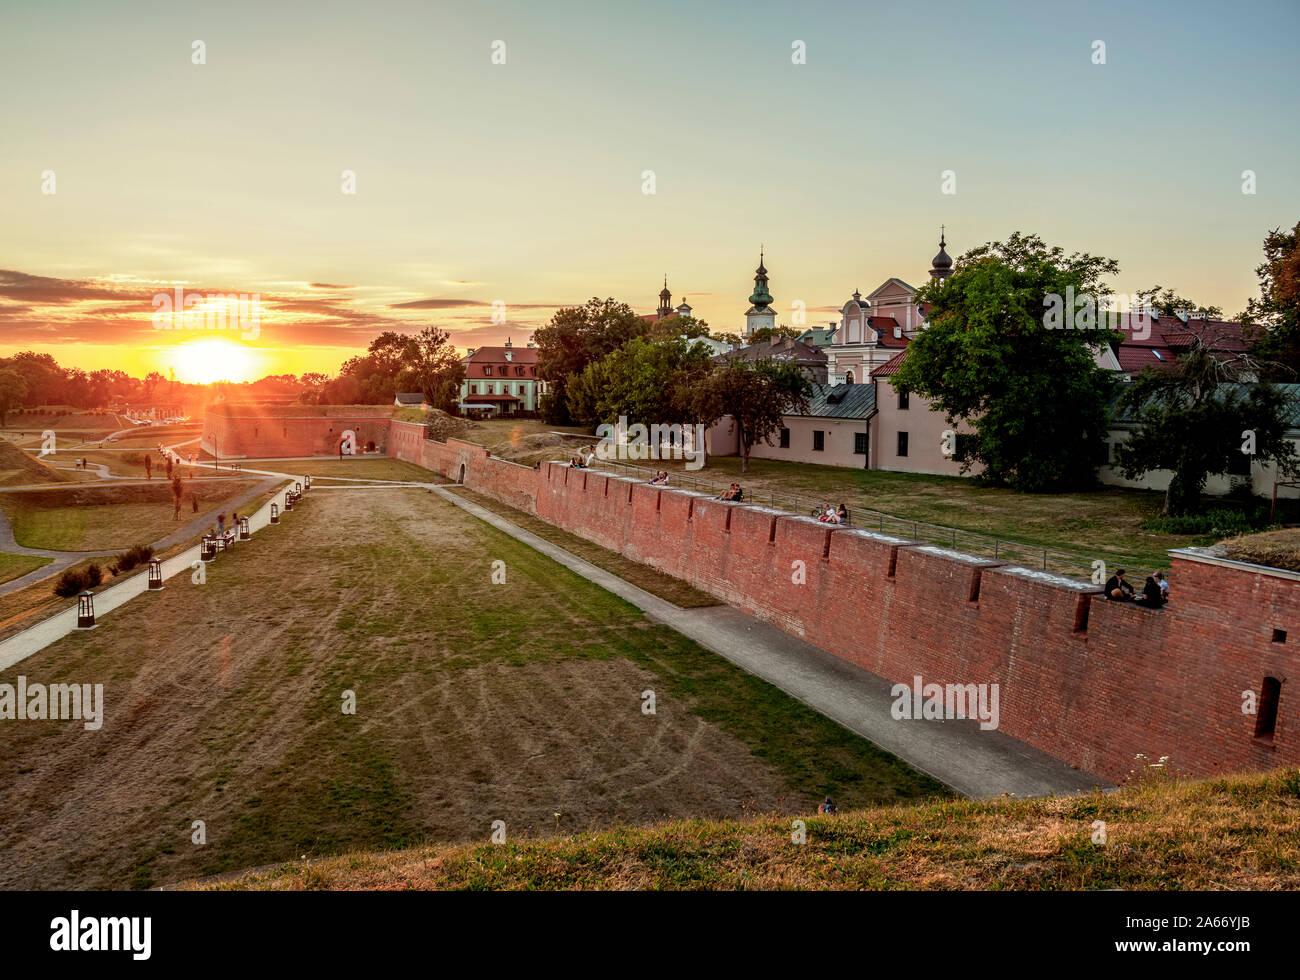 Old Town Walls at sunset, Zamosc, Lublin Voivodeship, Poland Stock Photo